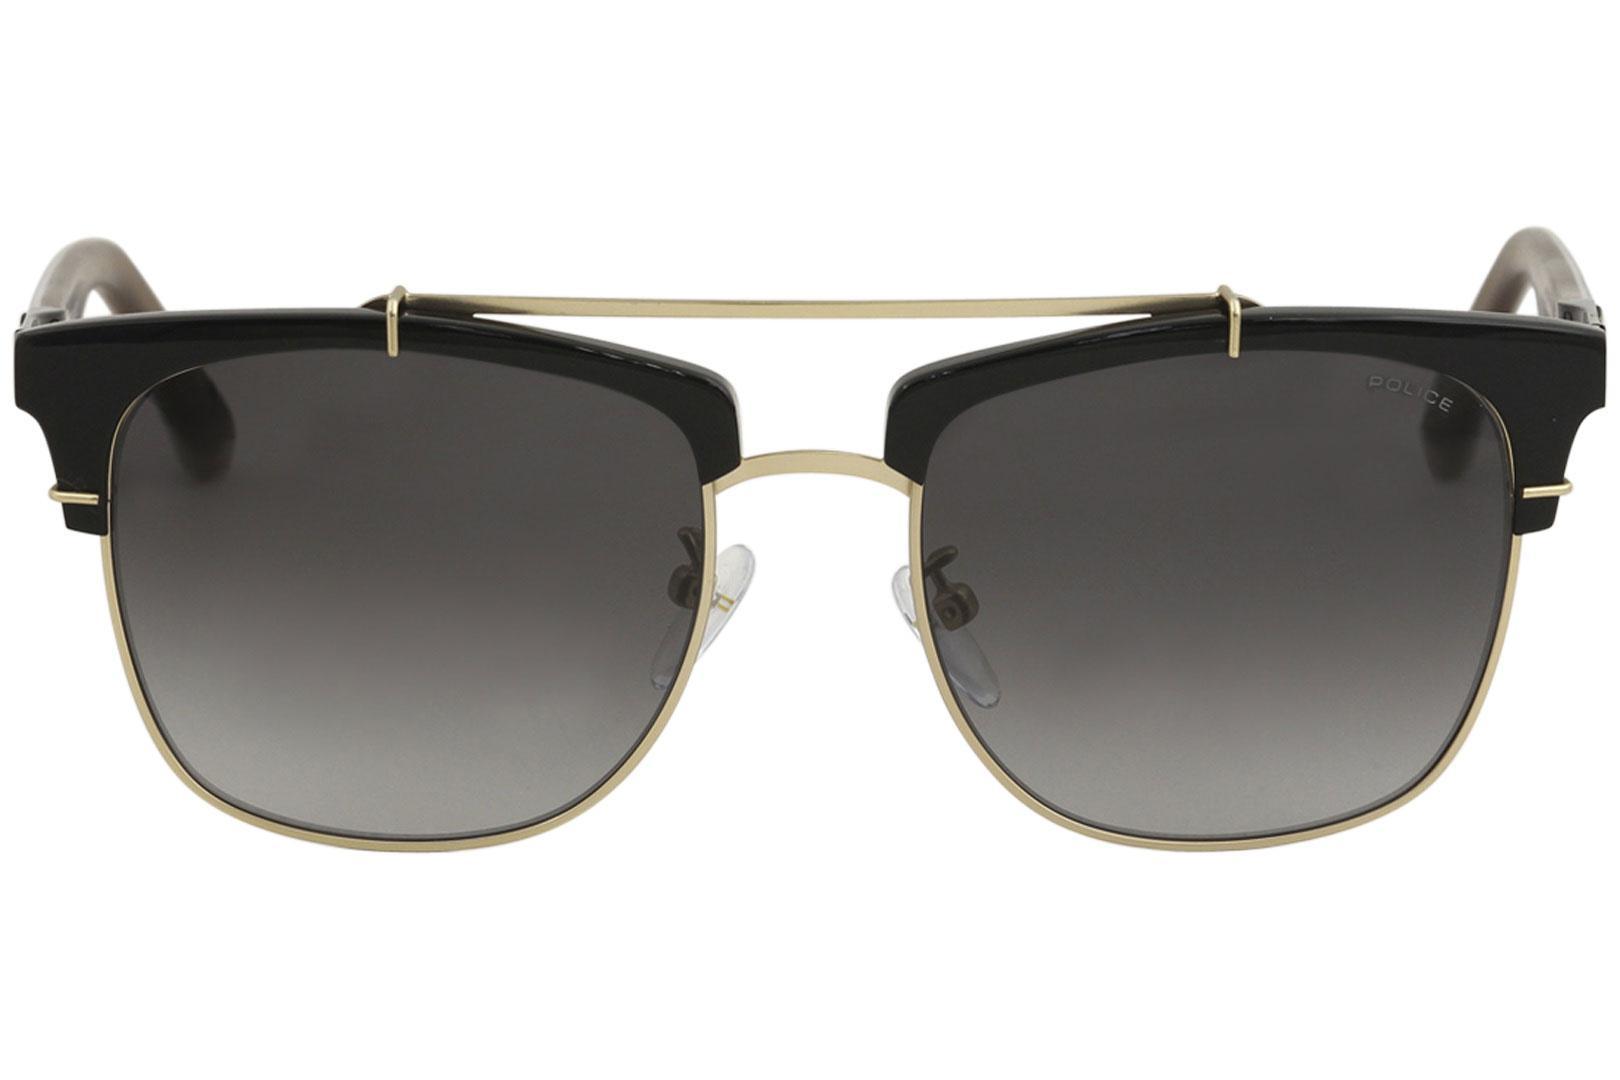 Block Police Fashion 2 Pilot Men's Sunglasses Spl494 CBoWdxre